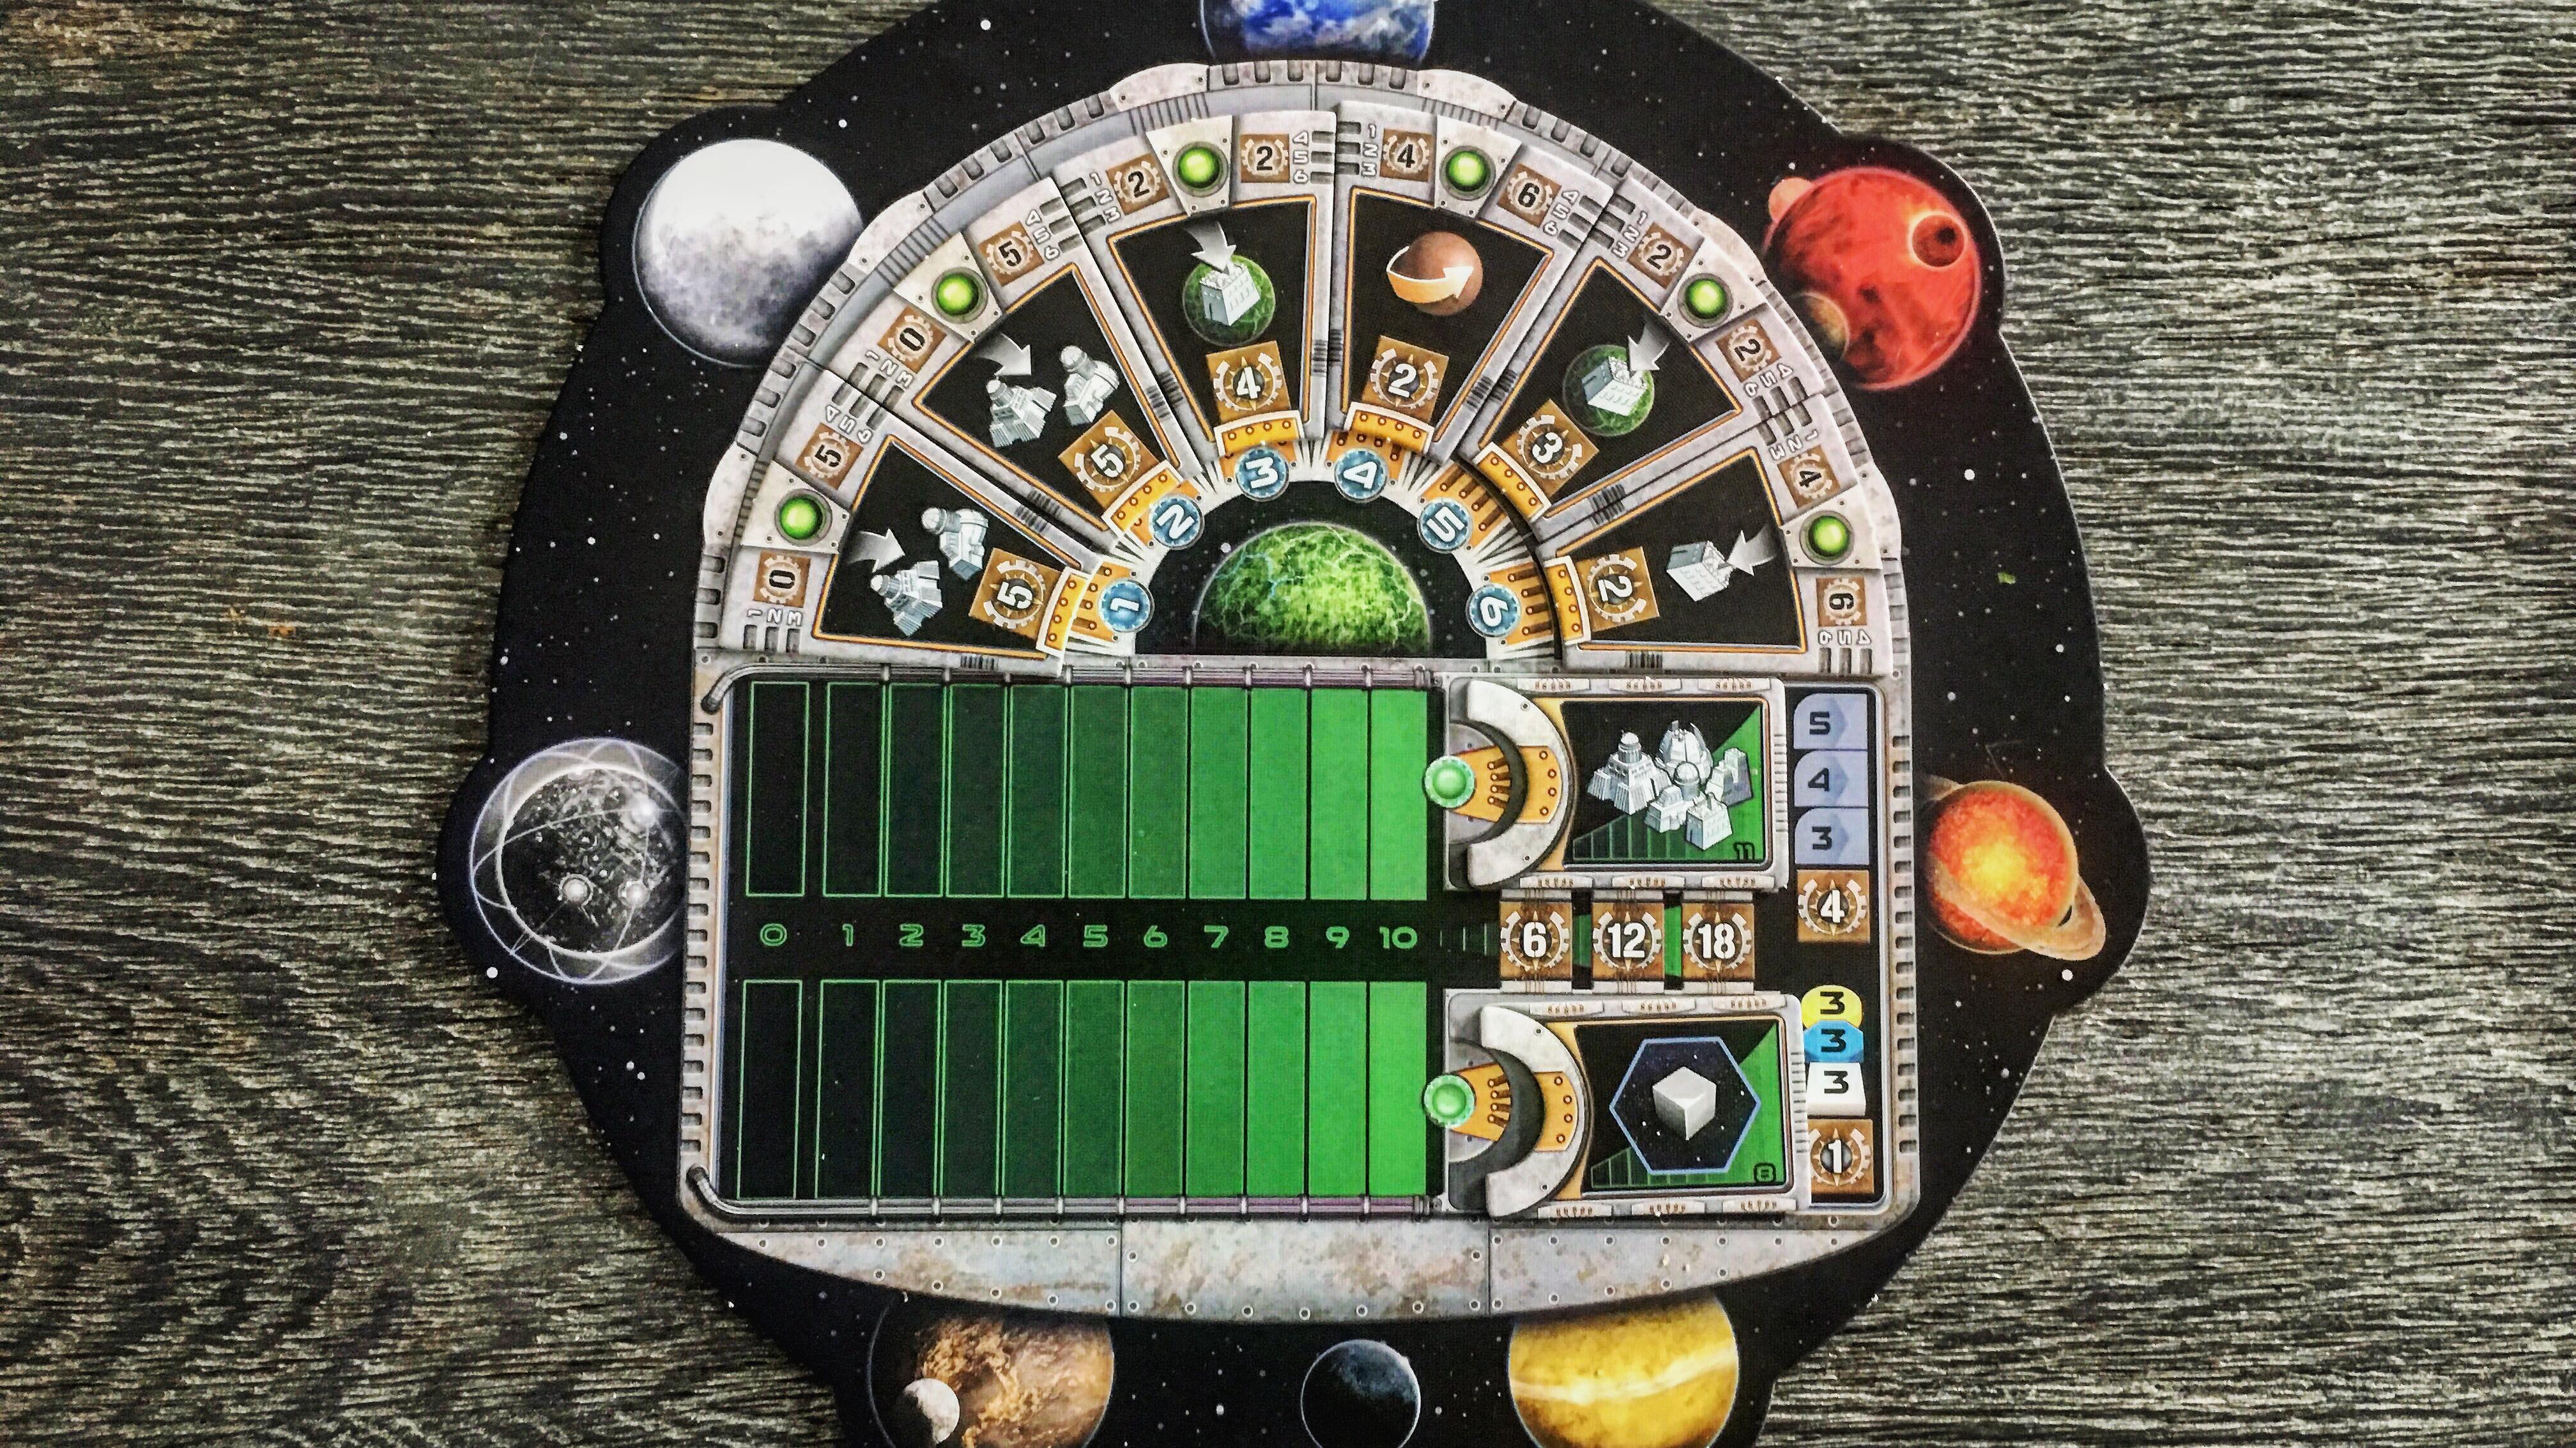 Project Gaia board game